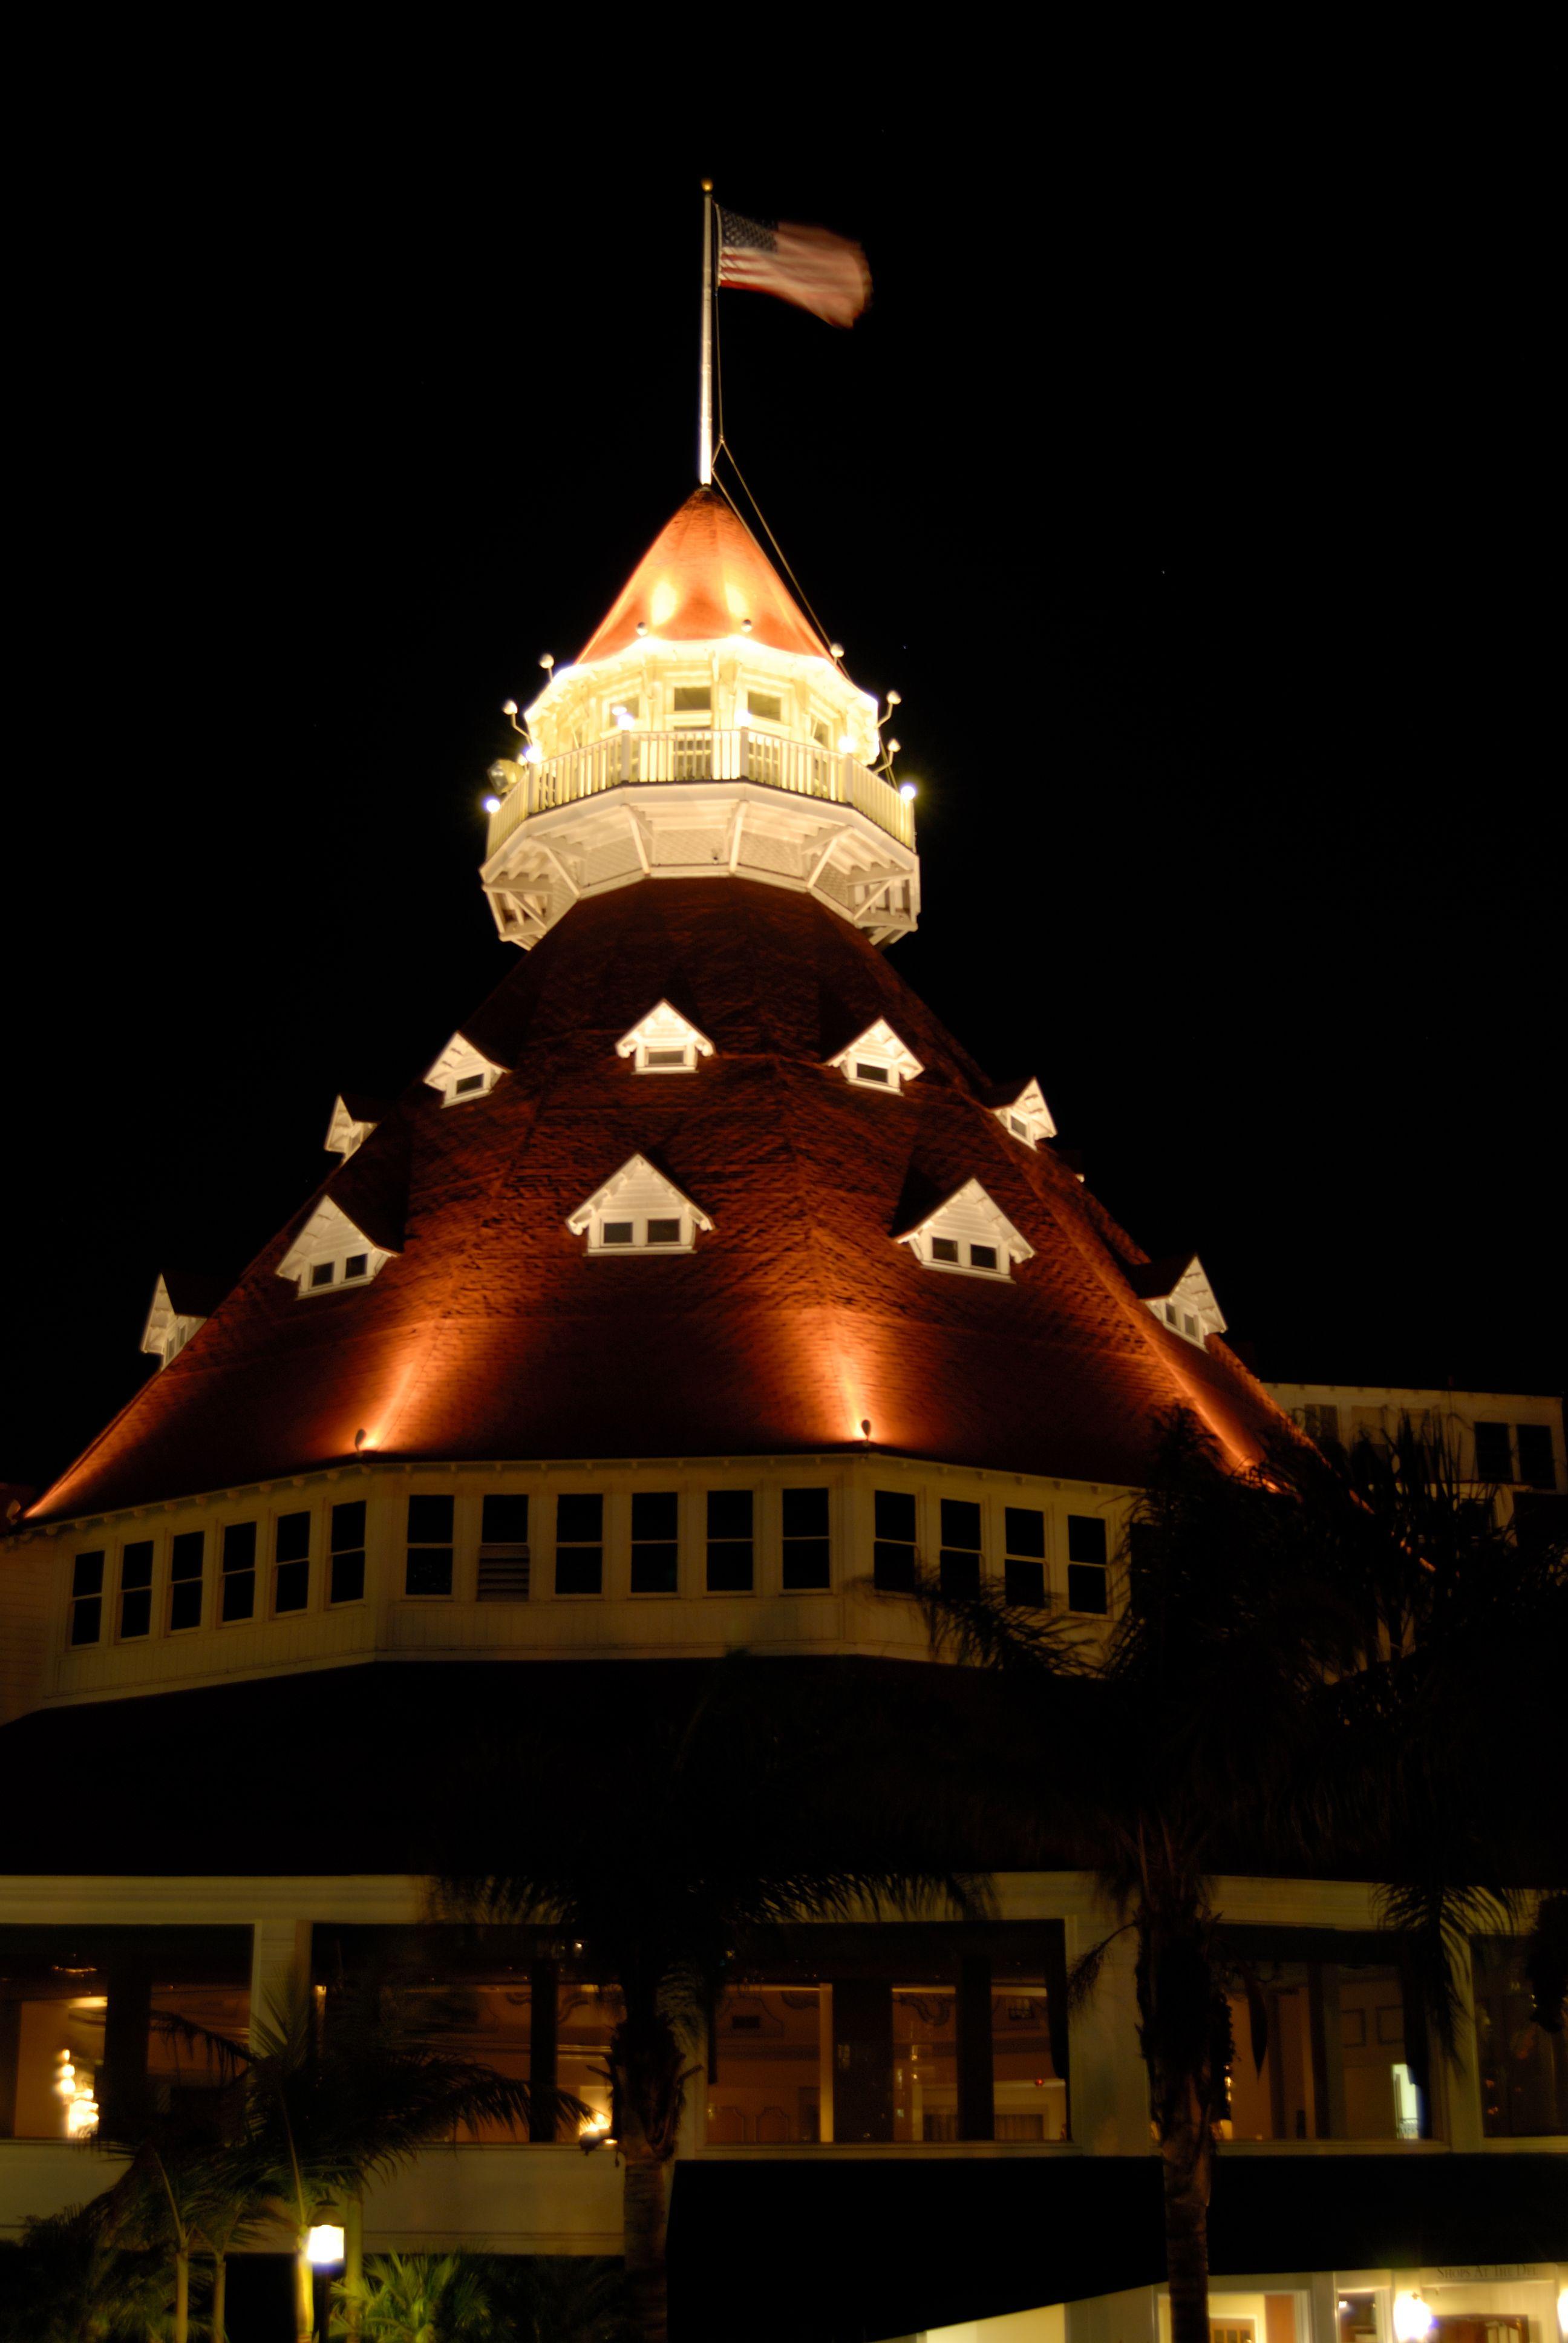 Hotel Del Coronado, Beautiful At Night, Featuring The Flag